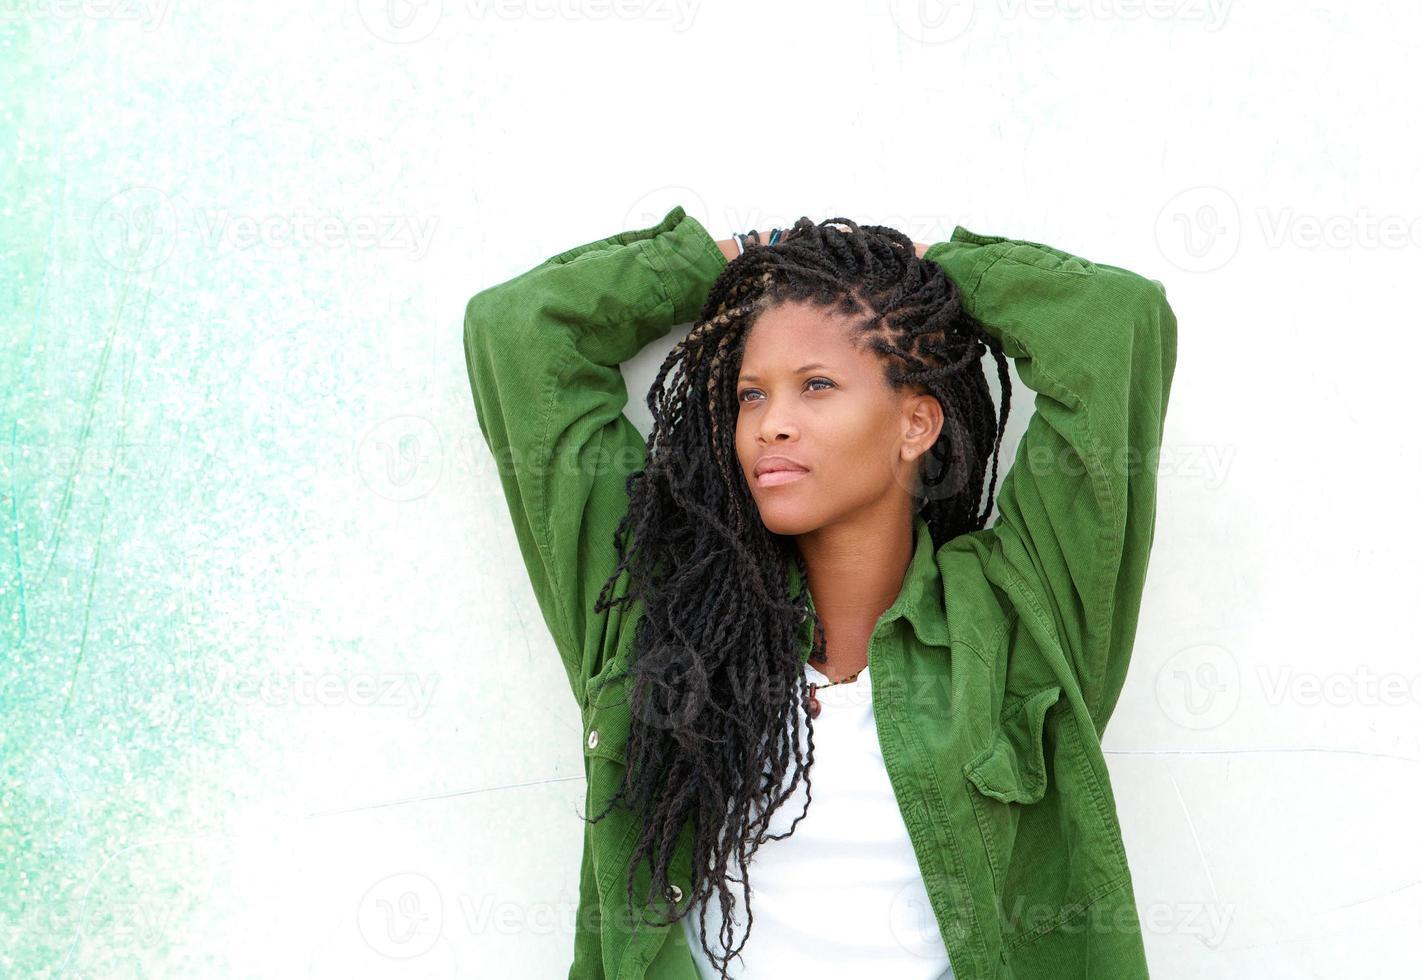 jonge zwarte die in openlucht ontspant foto